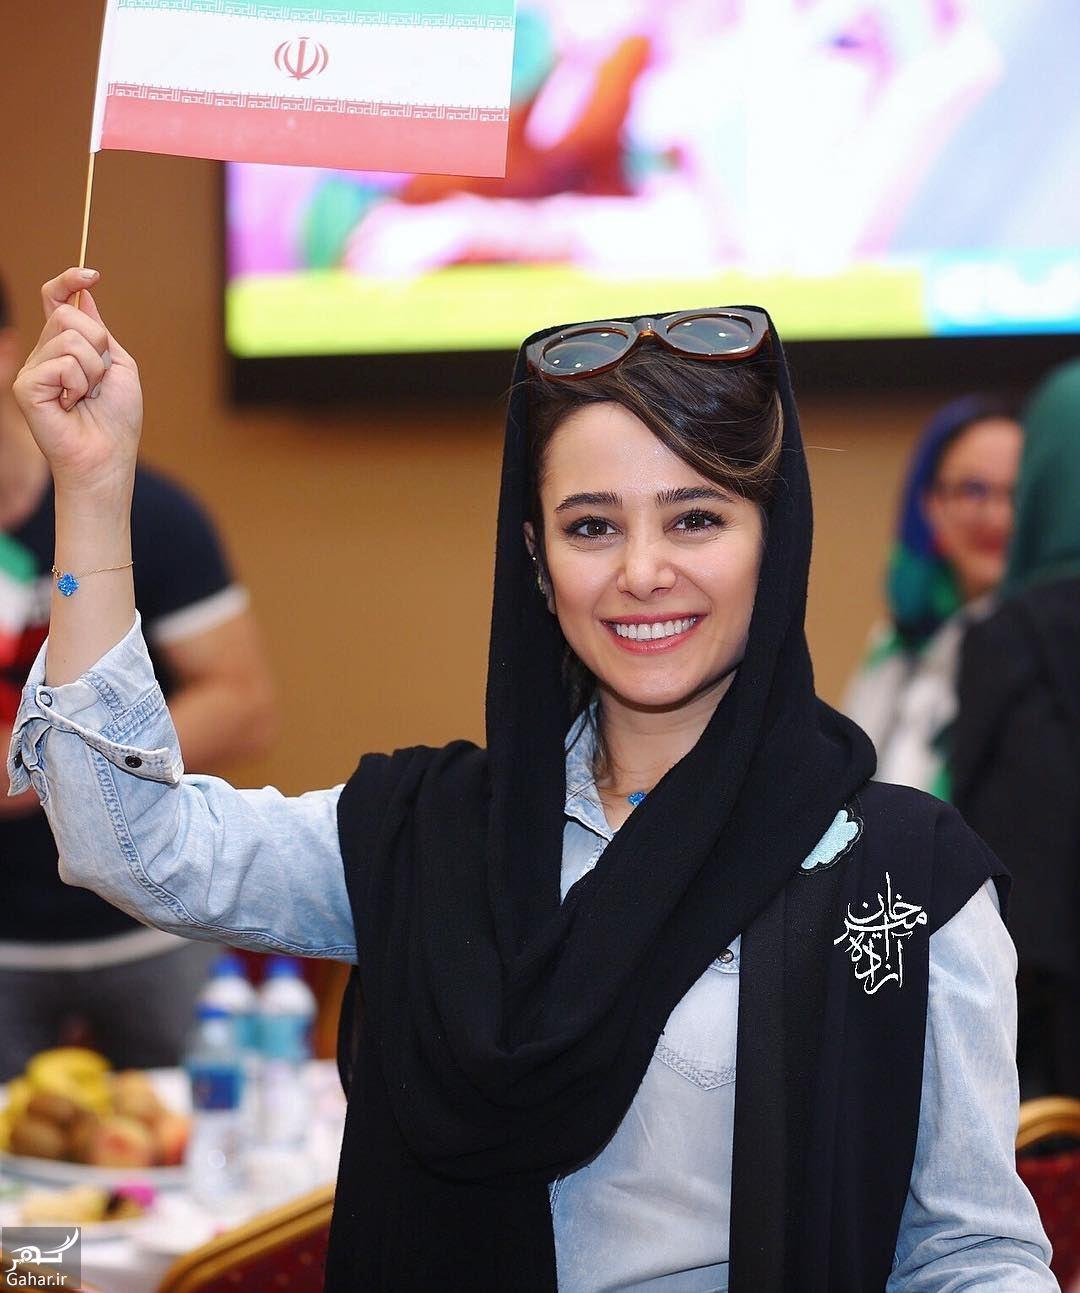 322752 Gahar ir مهمانی خصوصی بازیگران به مناسبت بازی ایران مراکش / تصاویر